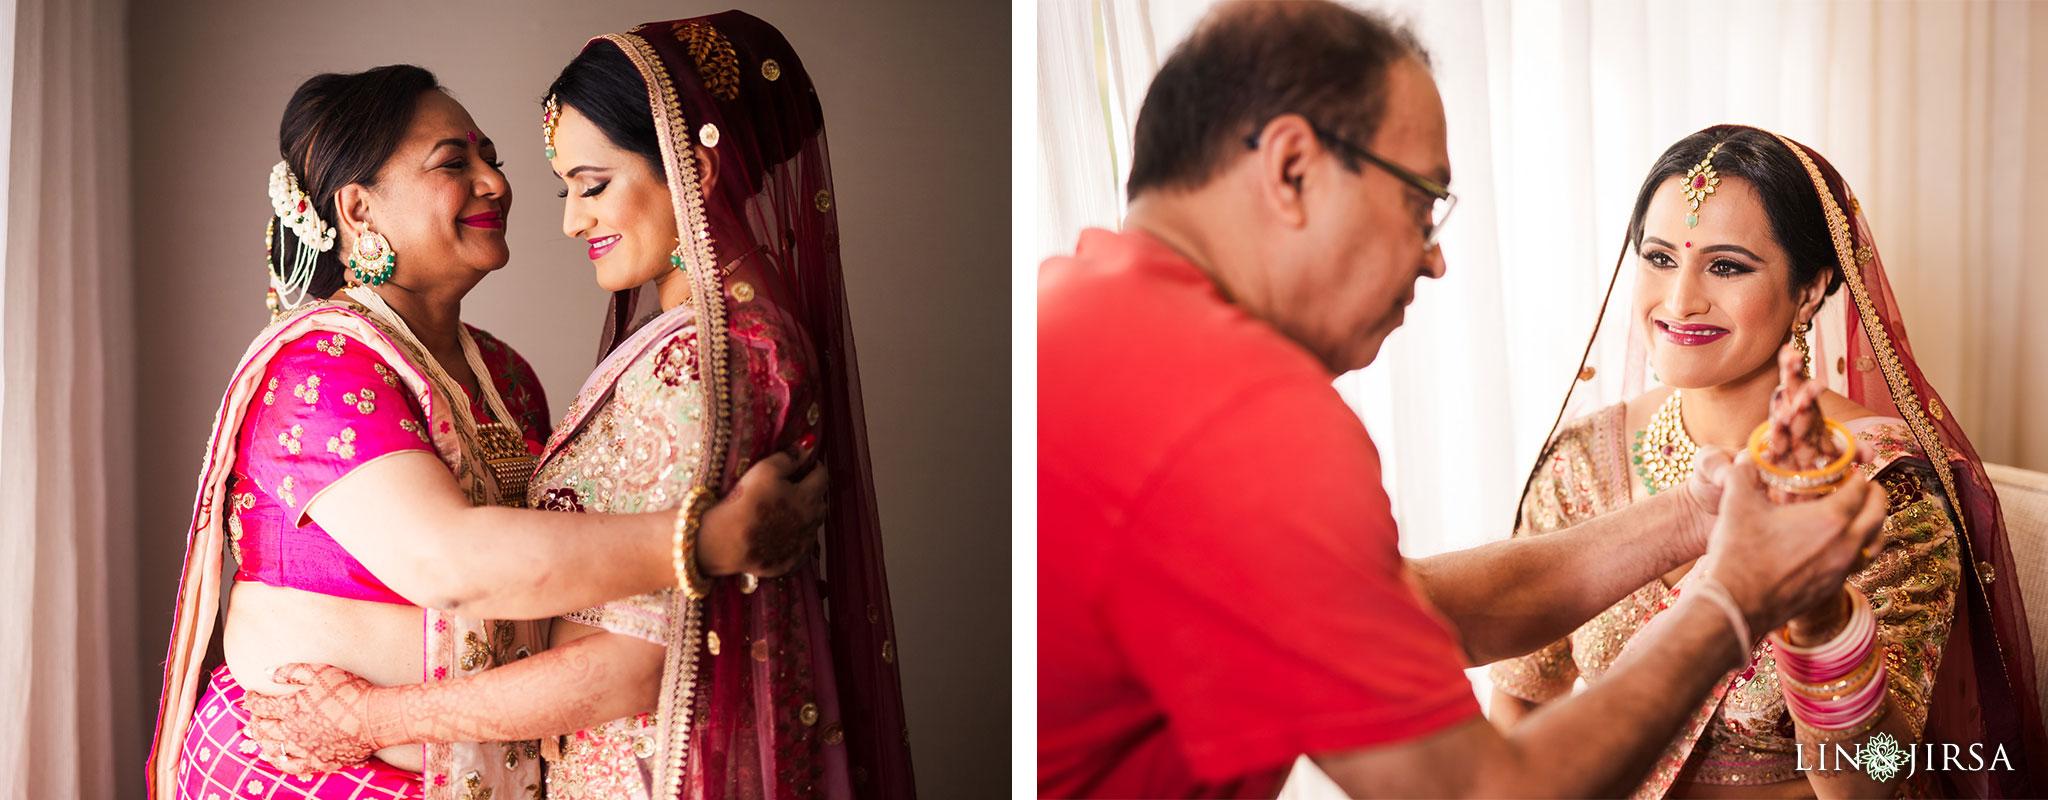 05 marina del rey marriott indian wedding photography